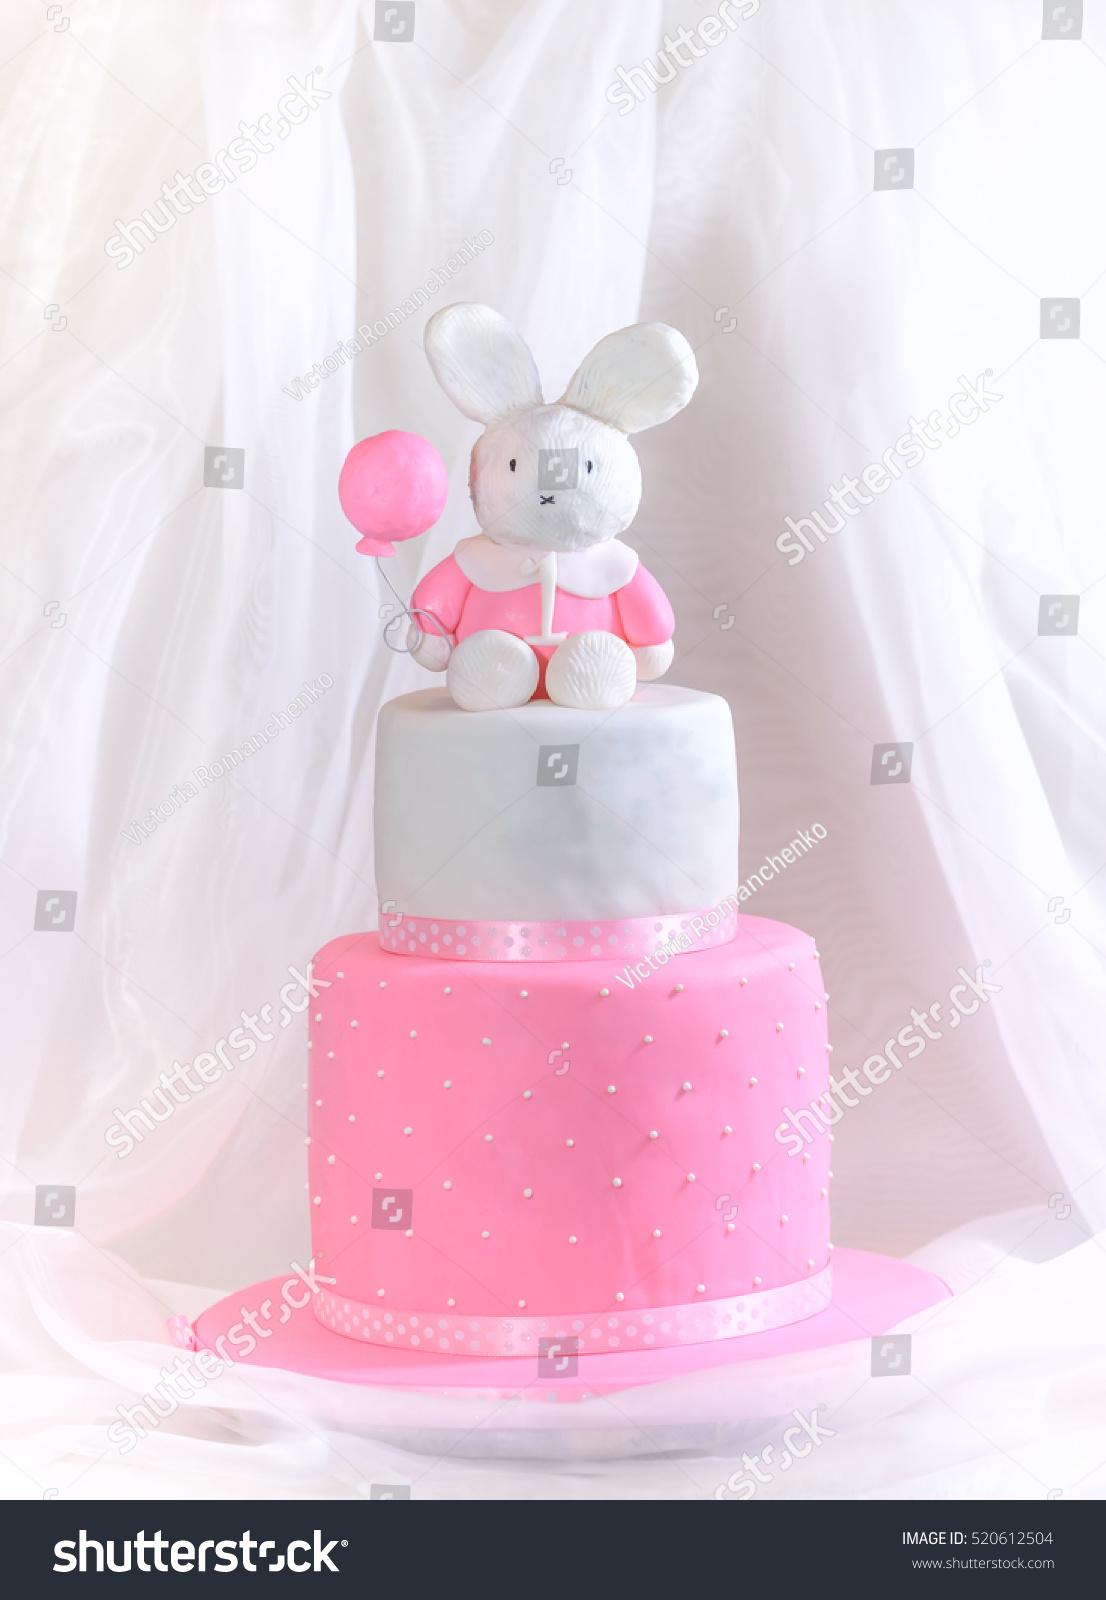 Fantastic Baby Girl Cake First Birthday Rabbit Stock Photo Edit Now 520612504 Funny Birthday Cards Online Barepcheapnameinfo